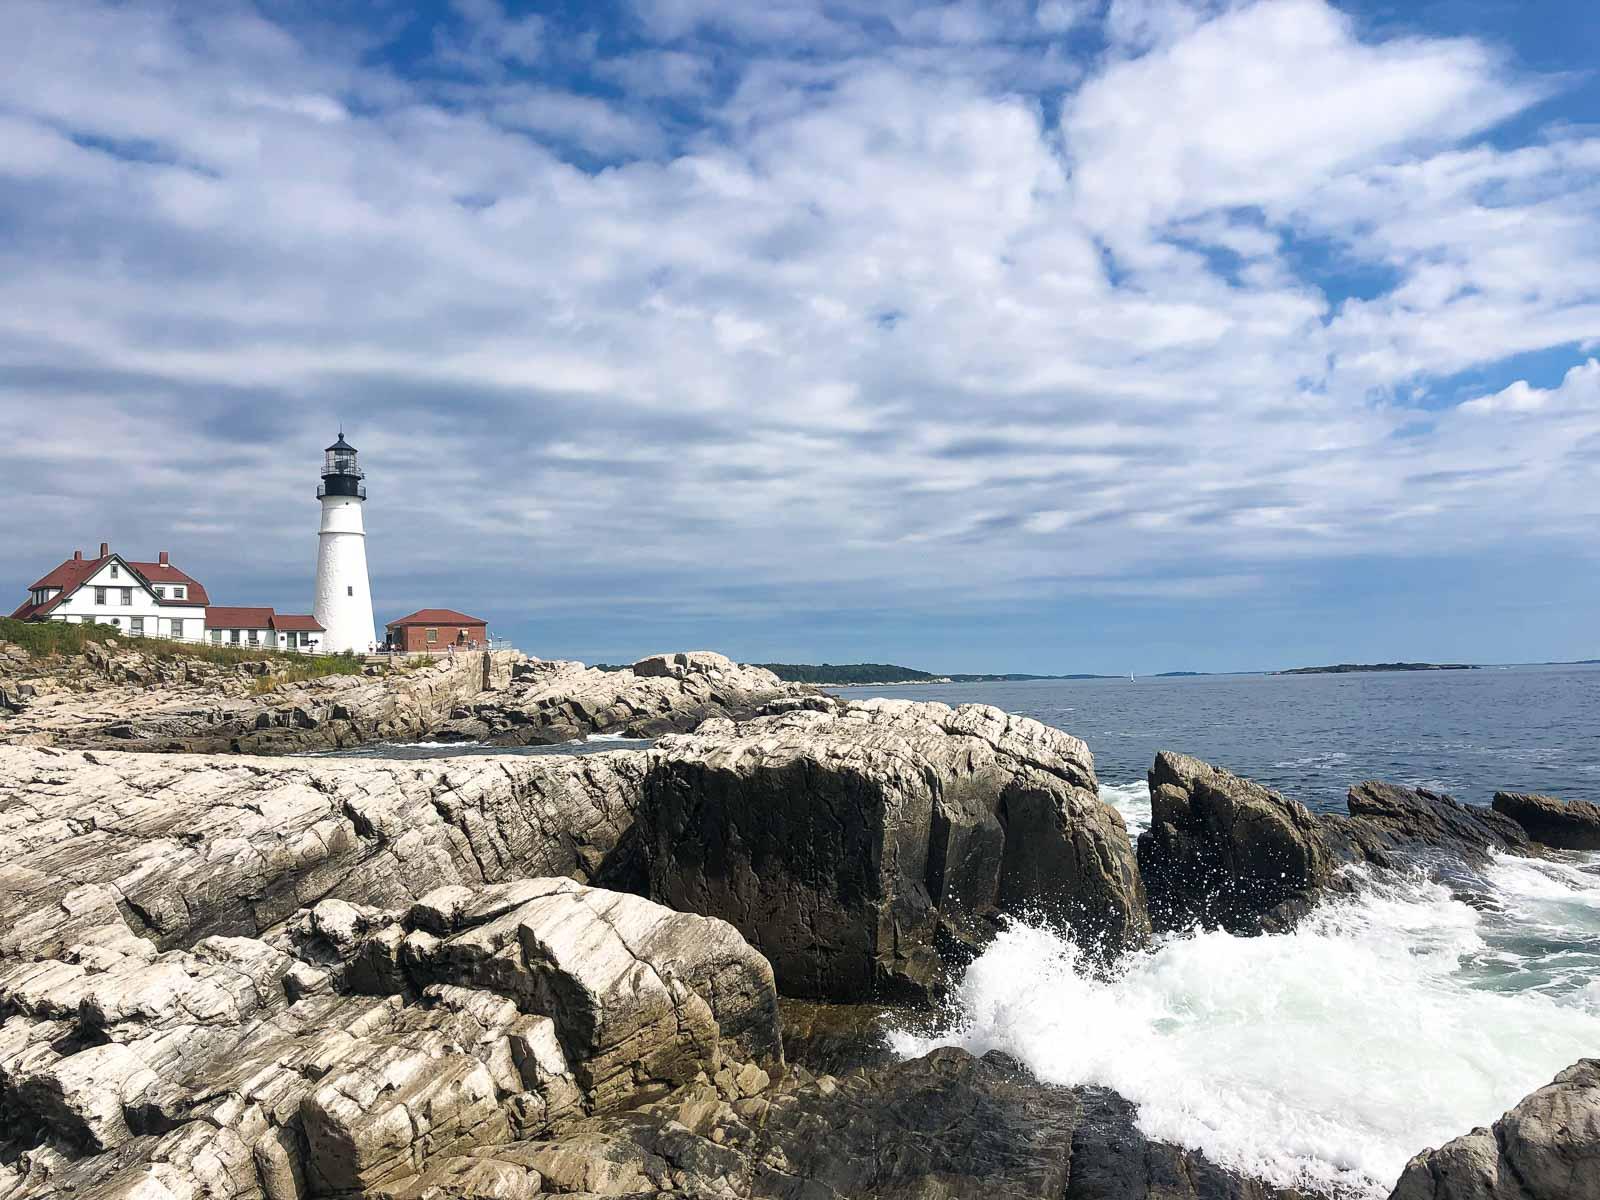 landscape photo of the portland head lighthouse with waves crashing on rocks